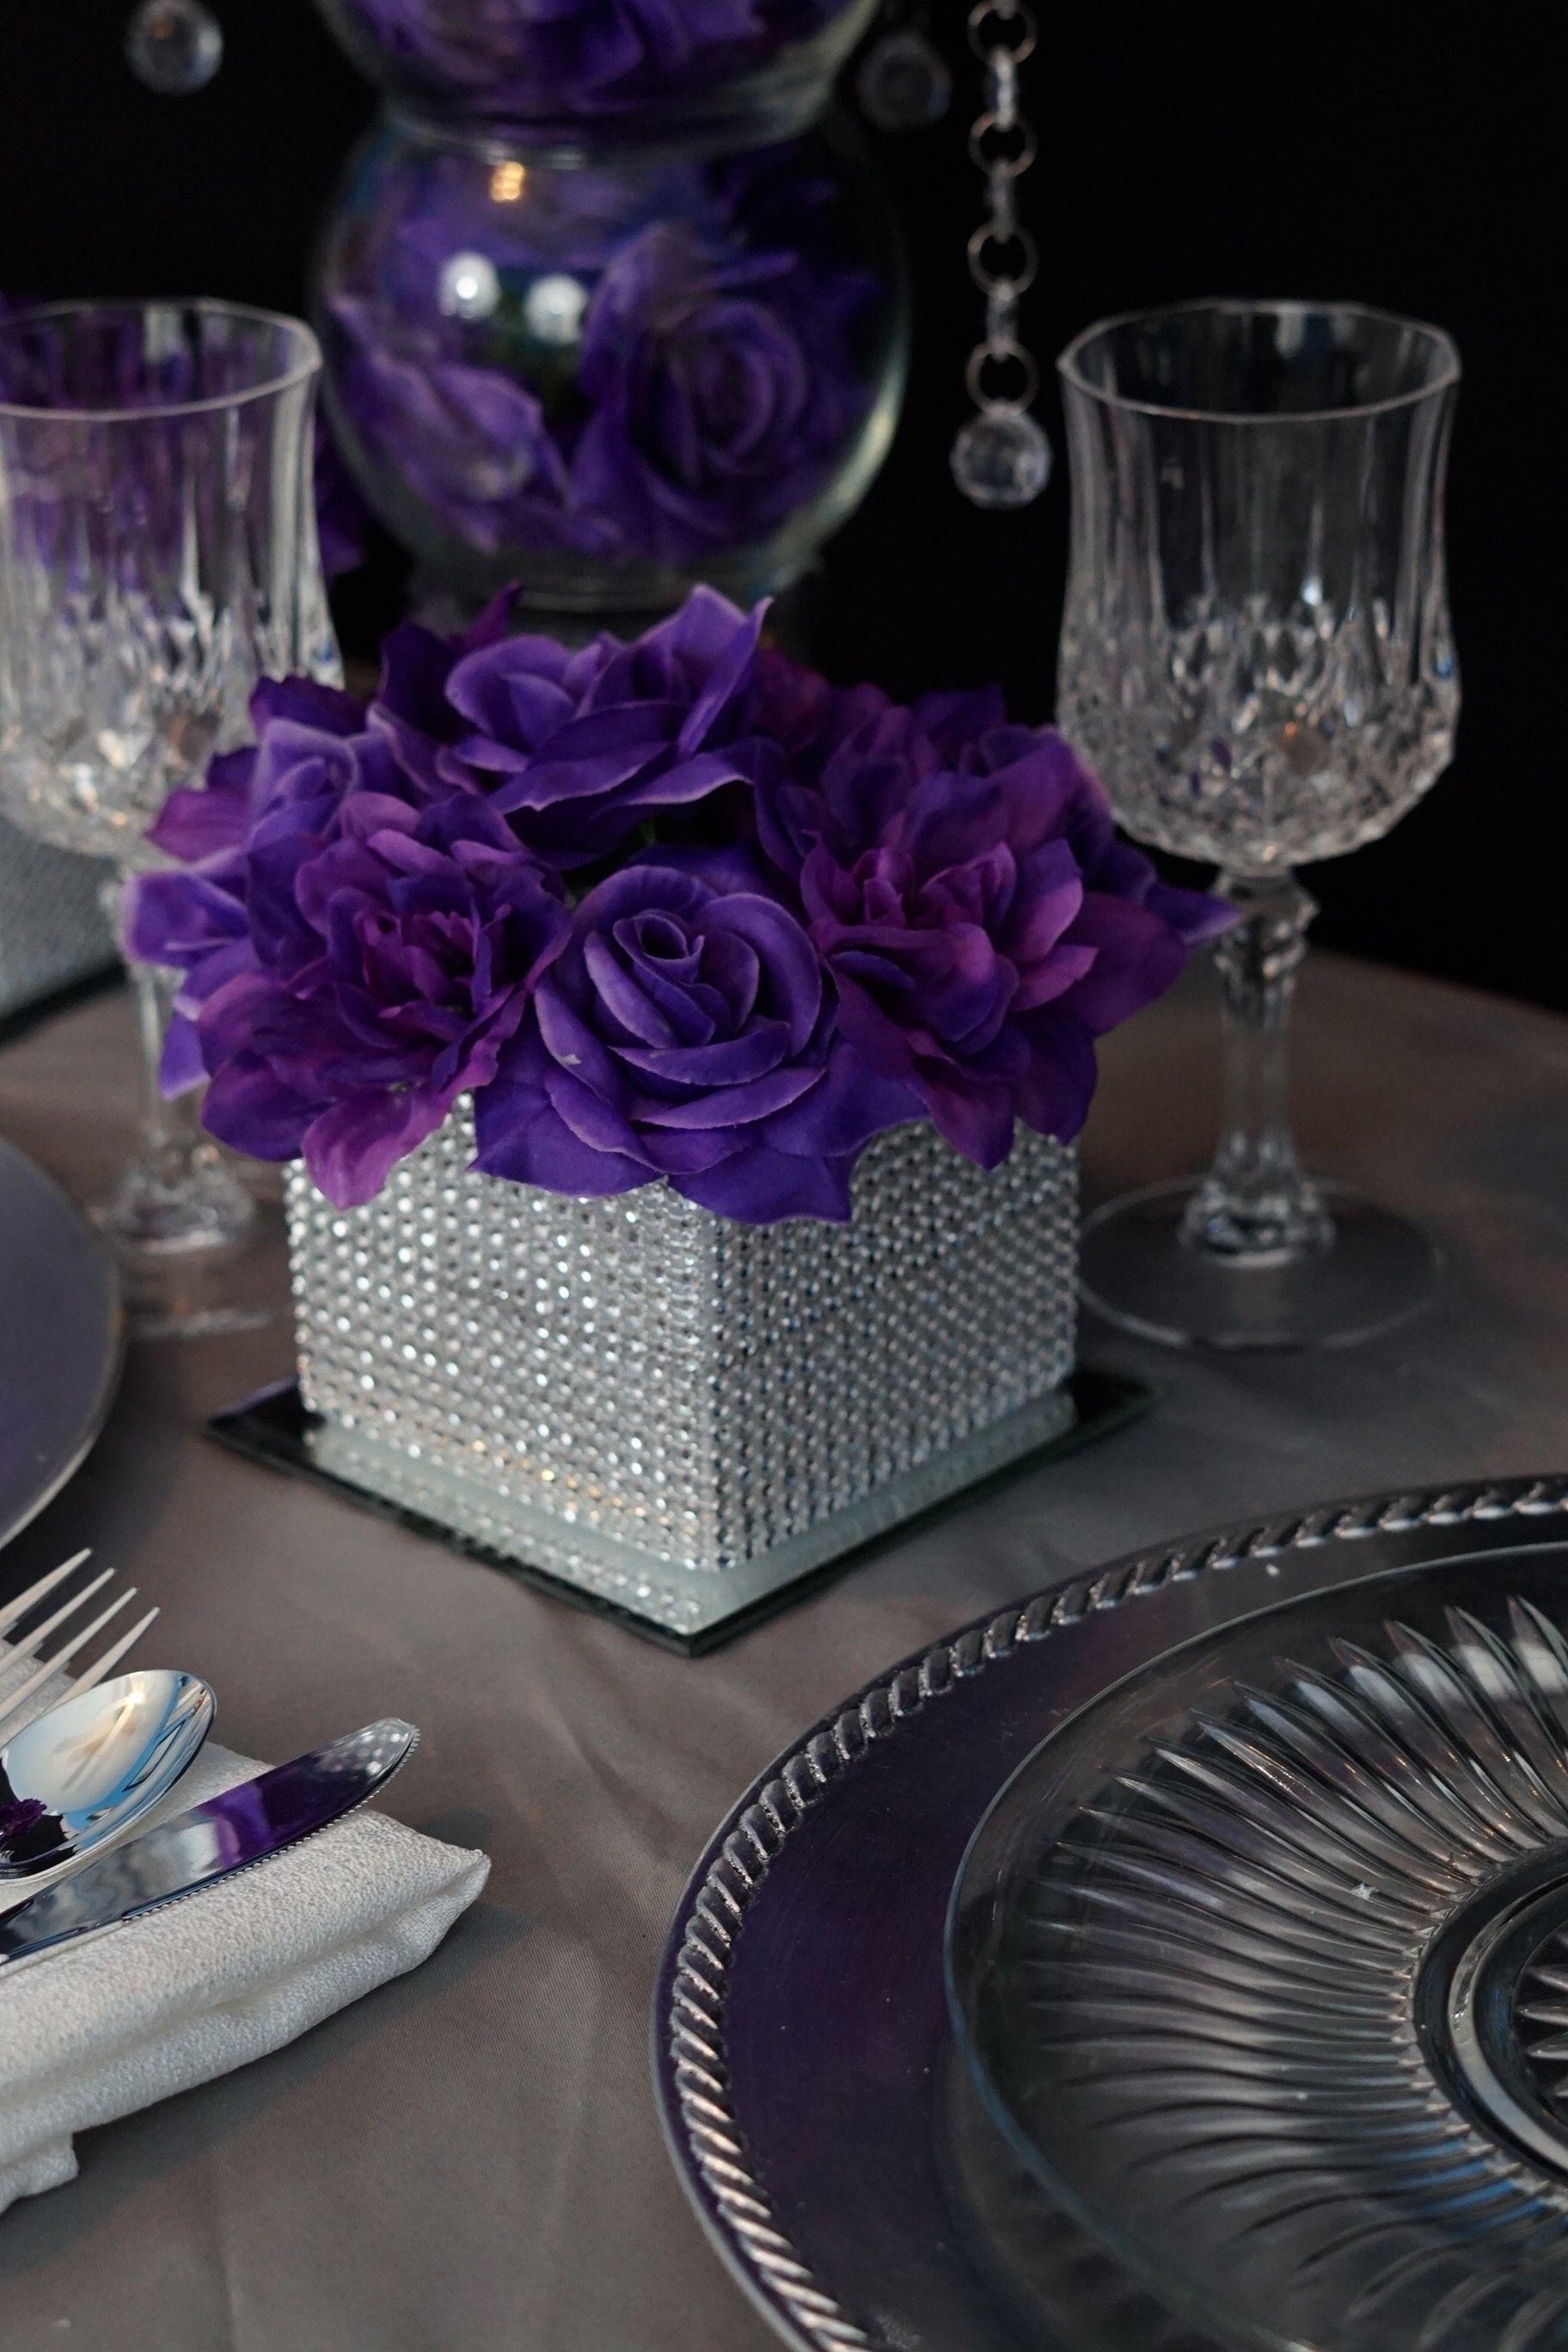 Diy Purple Passion Wedding Centerpiece In 3 Easy Steps Wedding